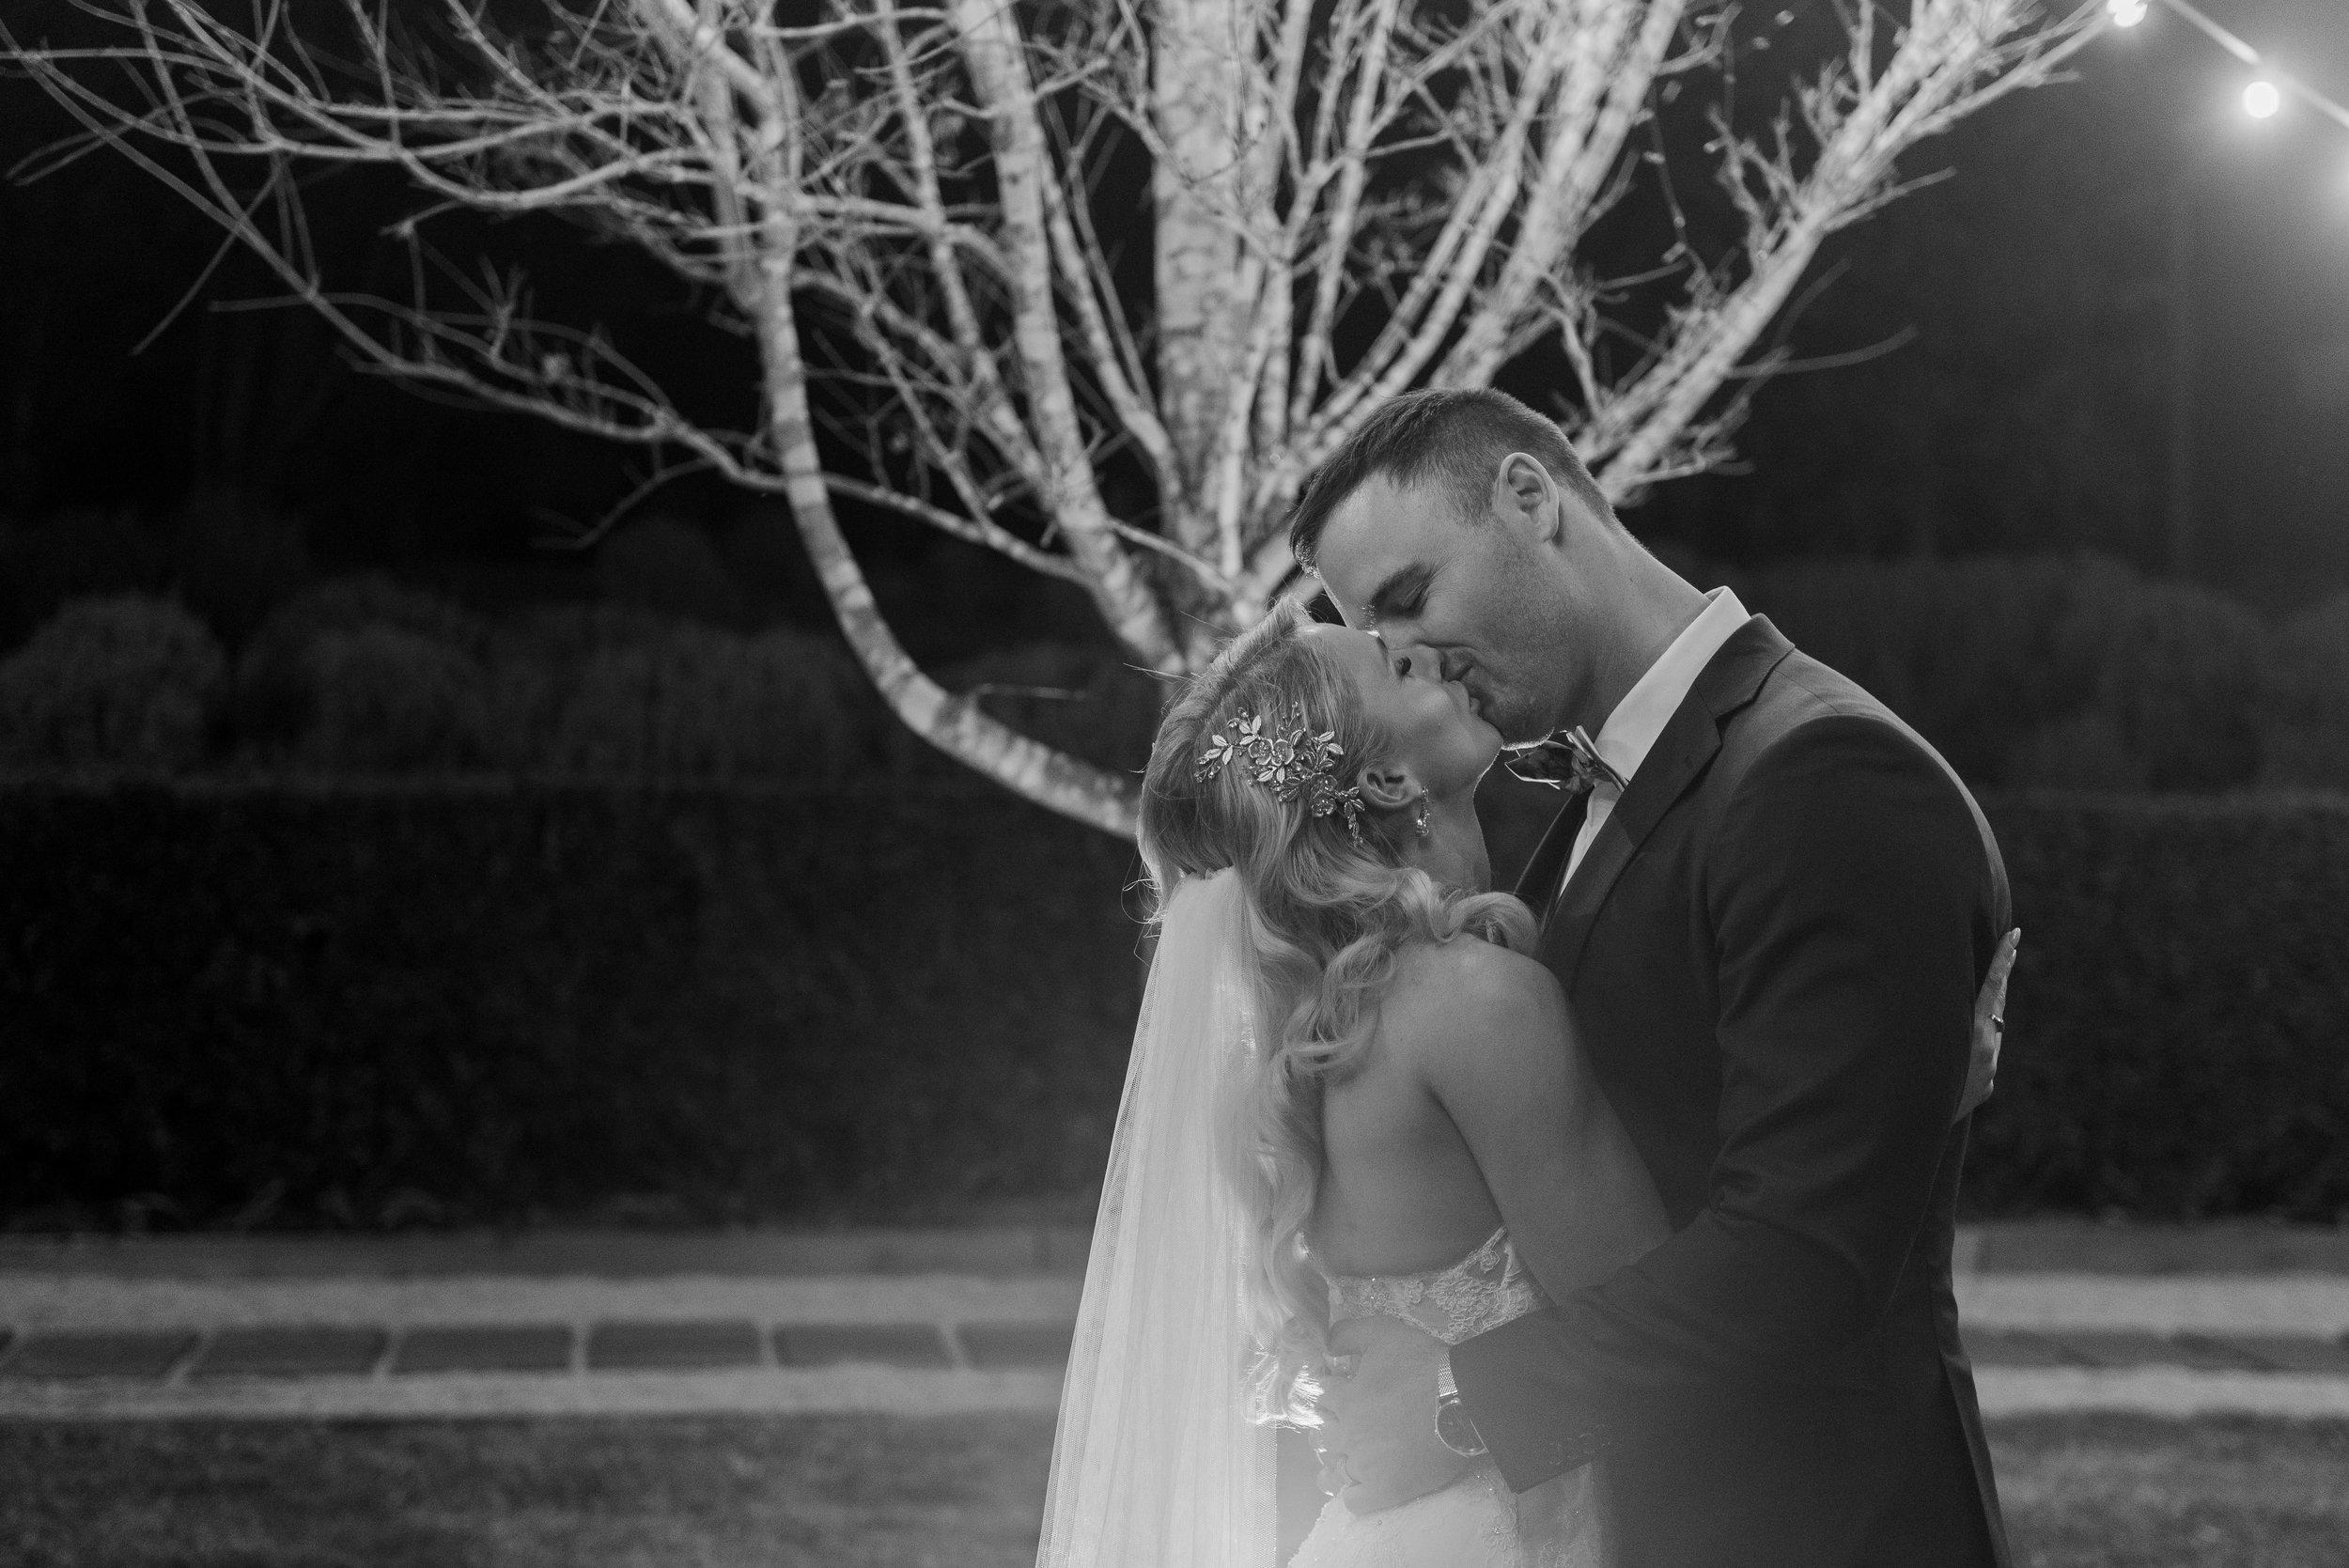 Kooroomba-Vineyard-Lavender-Farm-Wedding-Fine-Art-Lauren-Olivia-106.jpg